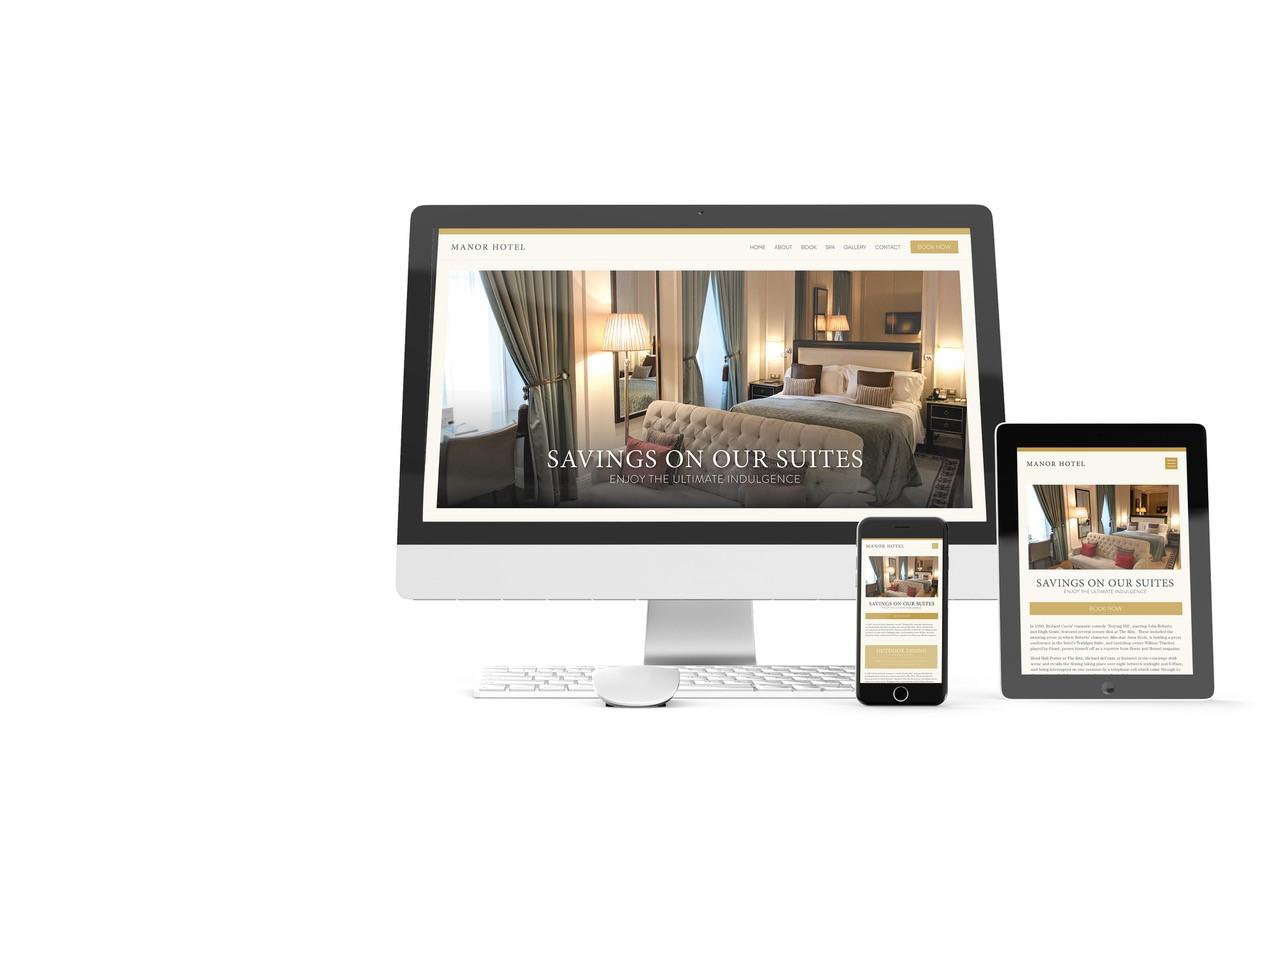 HOTEL WEBSITE DESIGN / HOTEL DIGITAL MARKETING / HOTEL GRAPHIC DESIGN